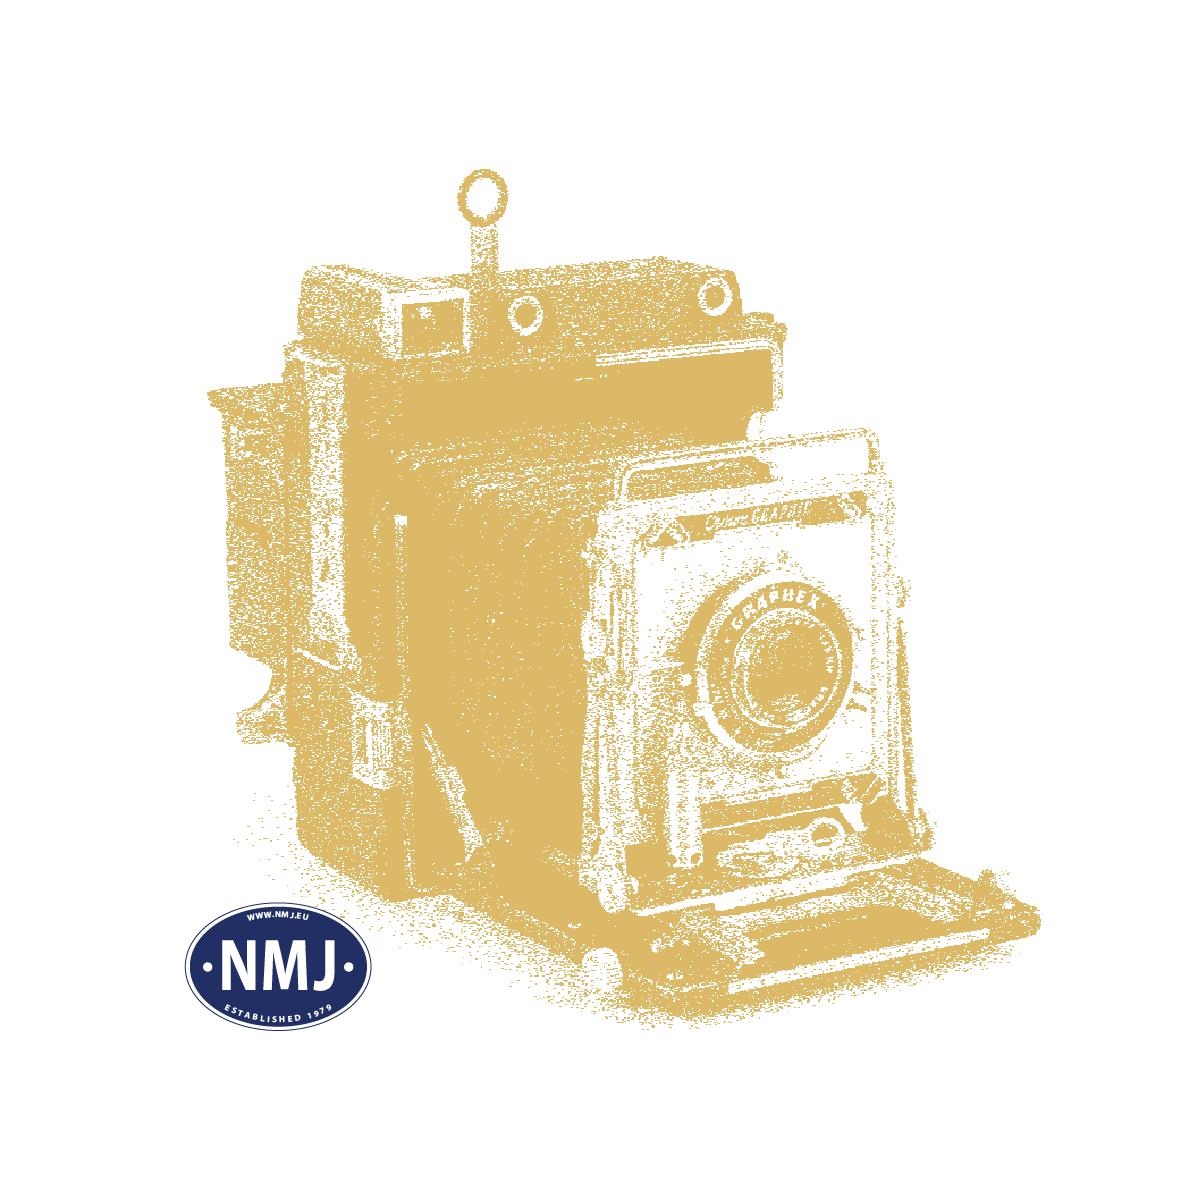 NMJT90302 - NMJ Topline CLF 1603 (1956-1971), DCC m/ Lyd